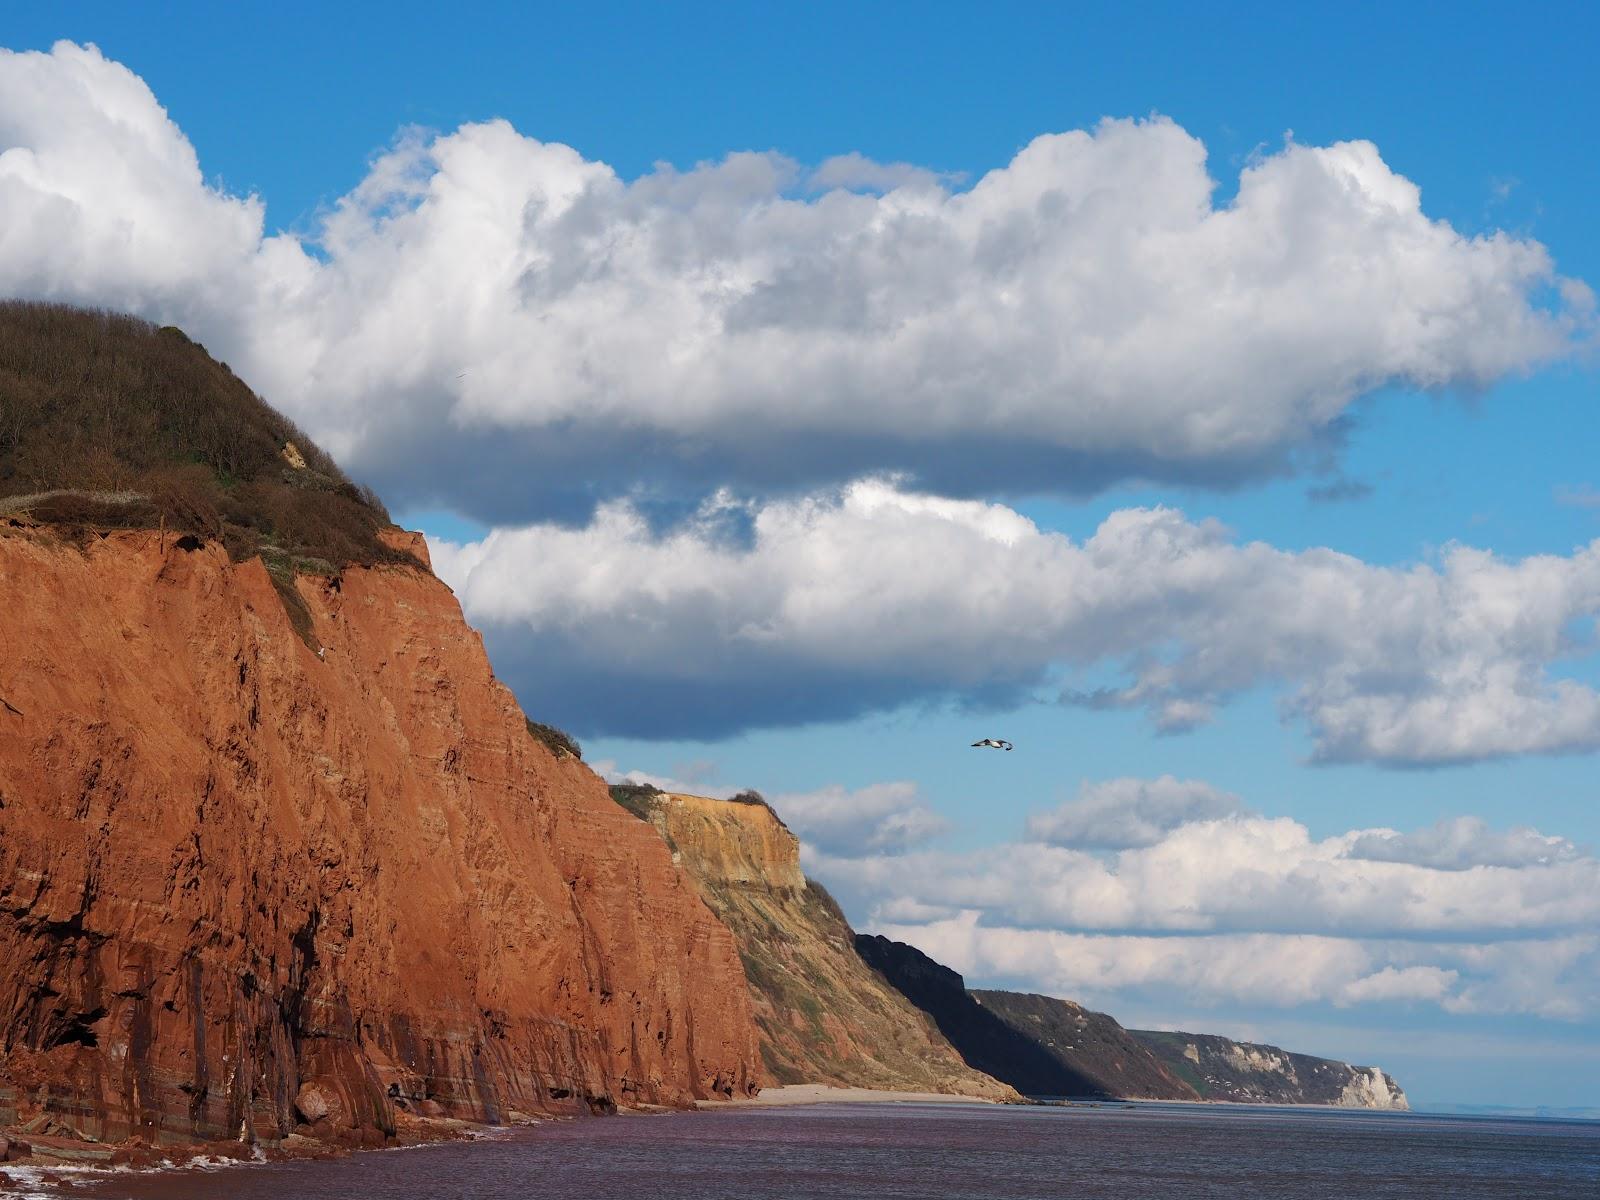 Jurassic Coastline with bright blue sky